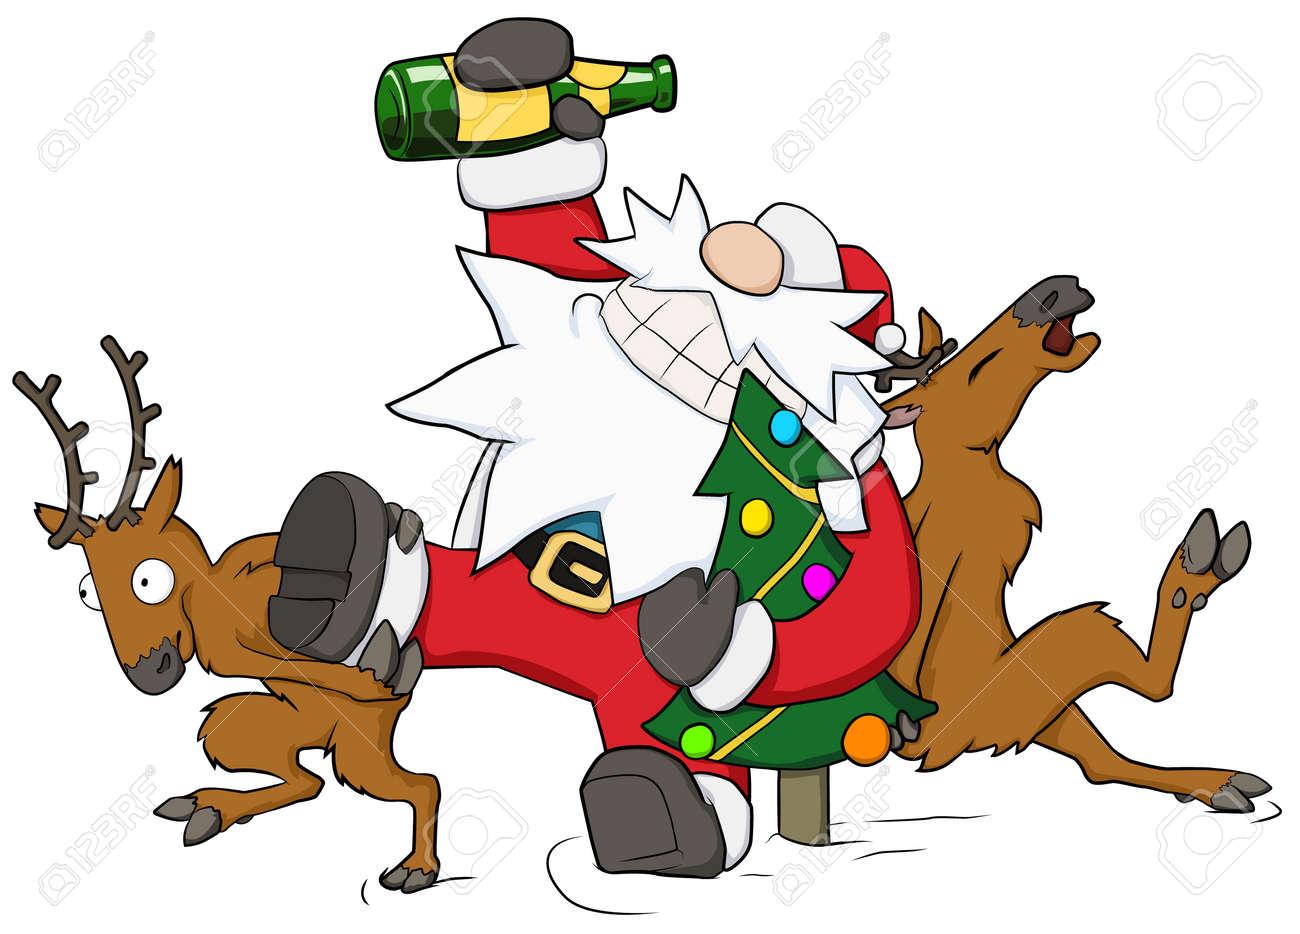 Christmas party celebration, reindeer pushing drunk Santa forward humorous cartoon illustration, horizontal, over white, isolated - 139948799